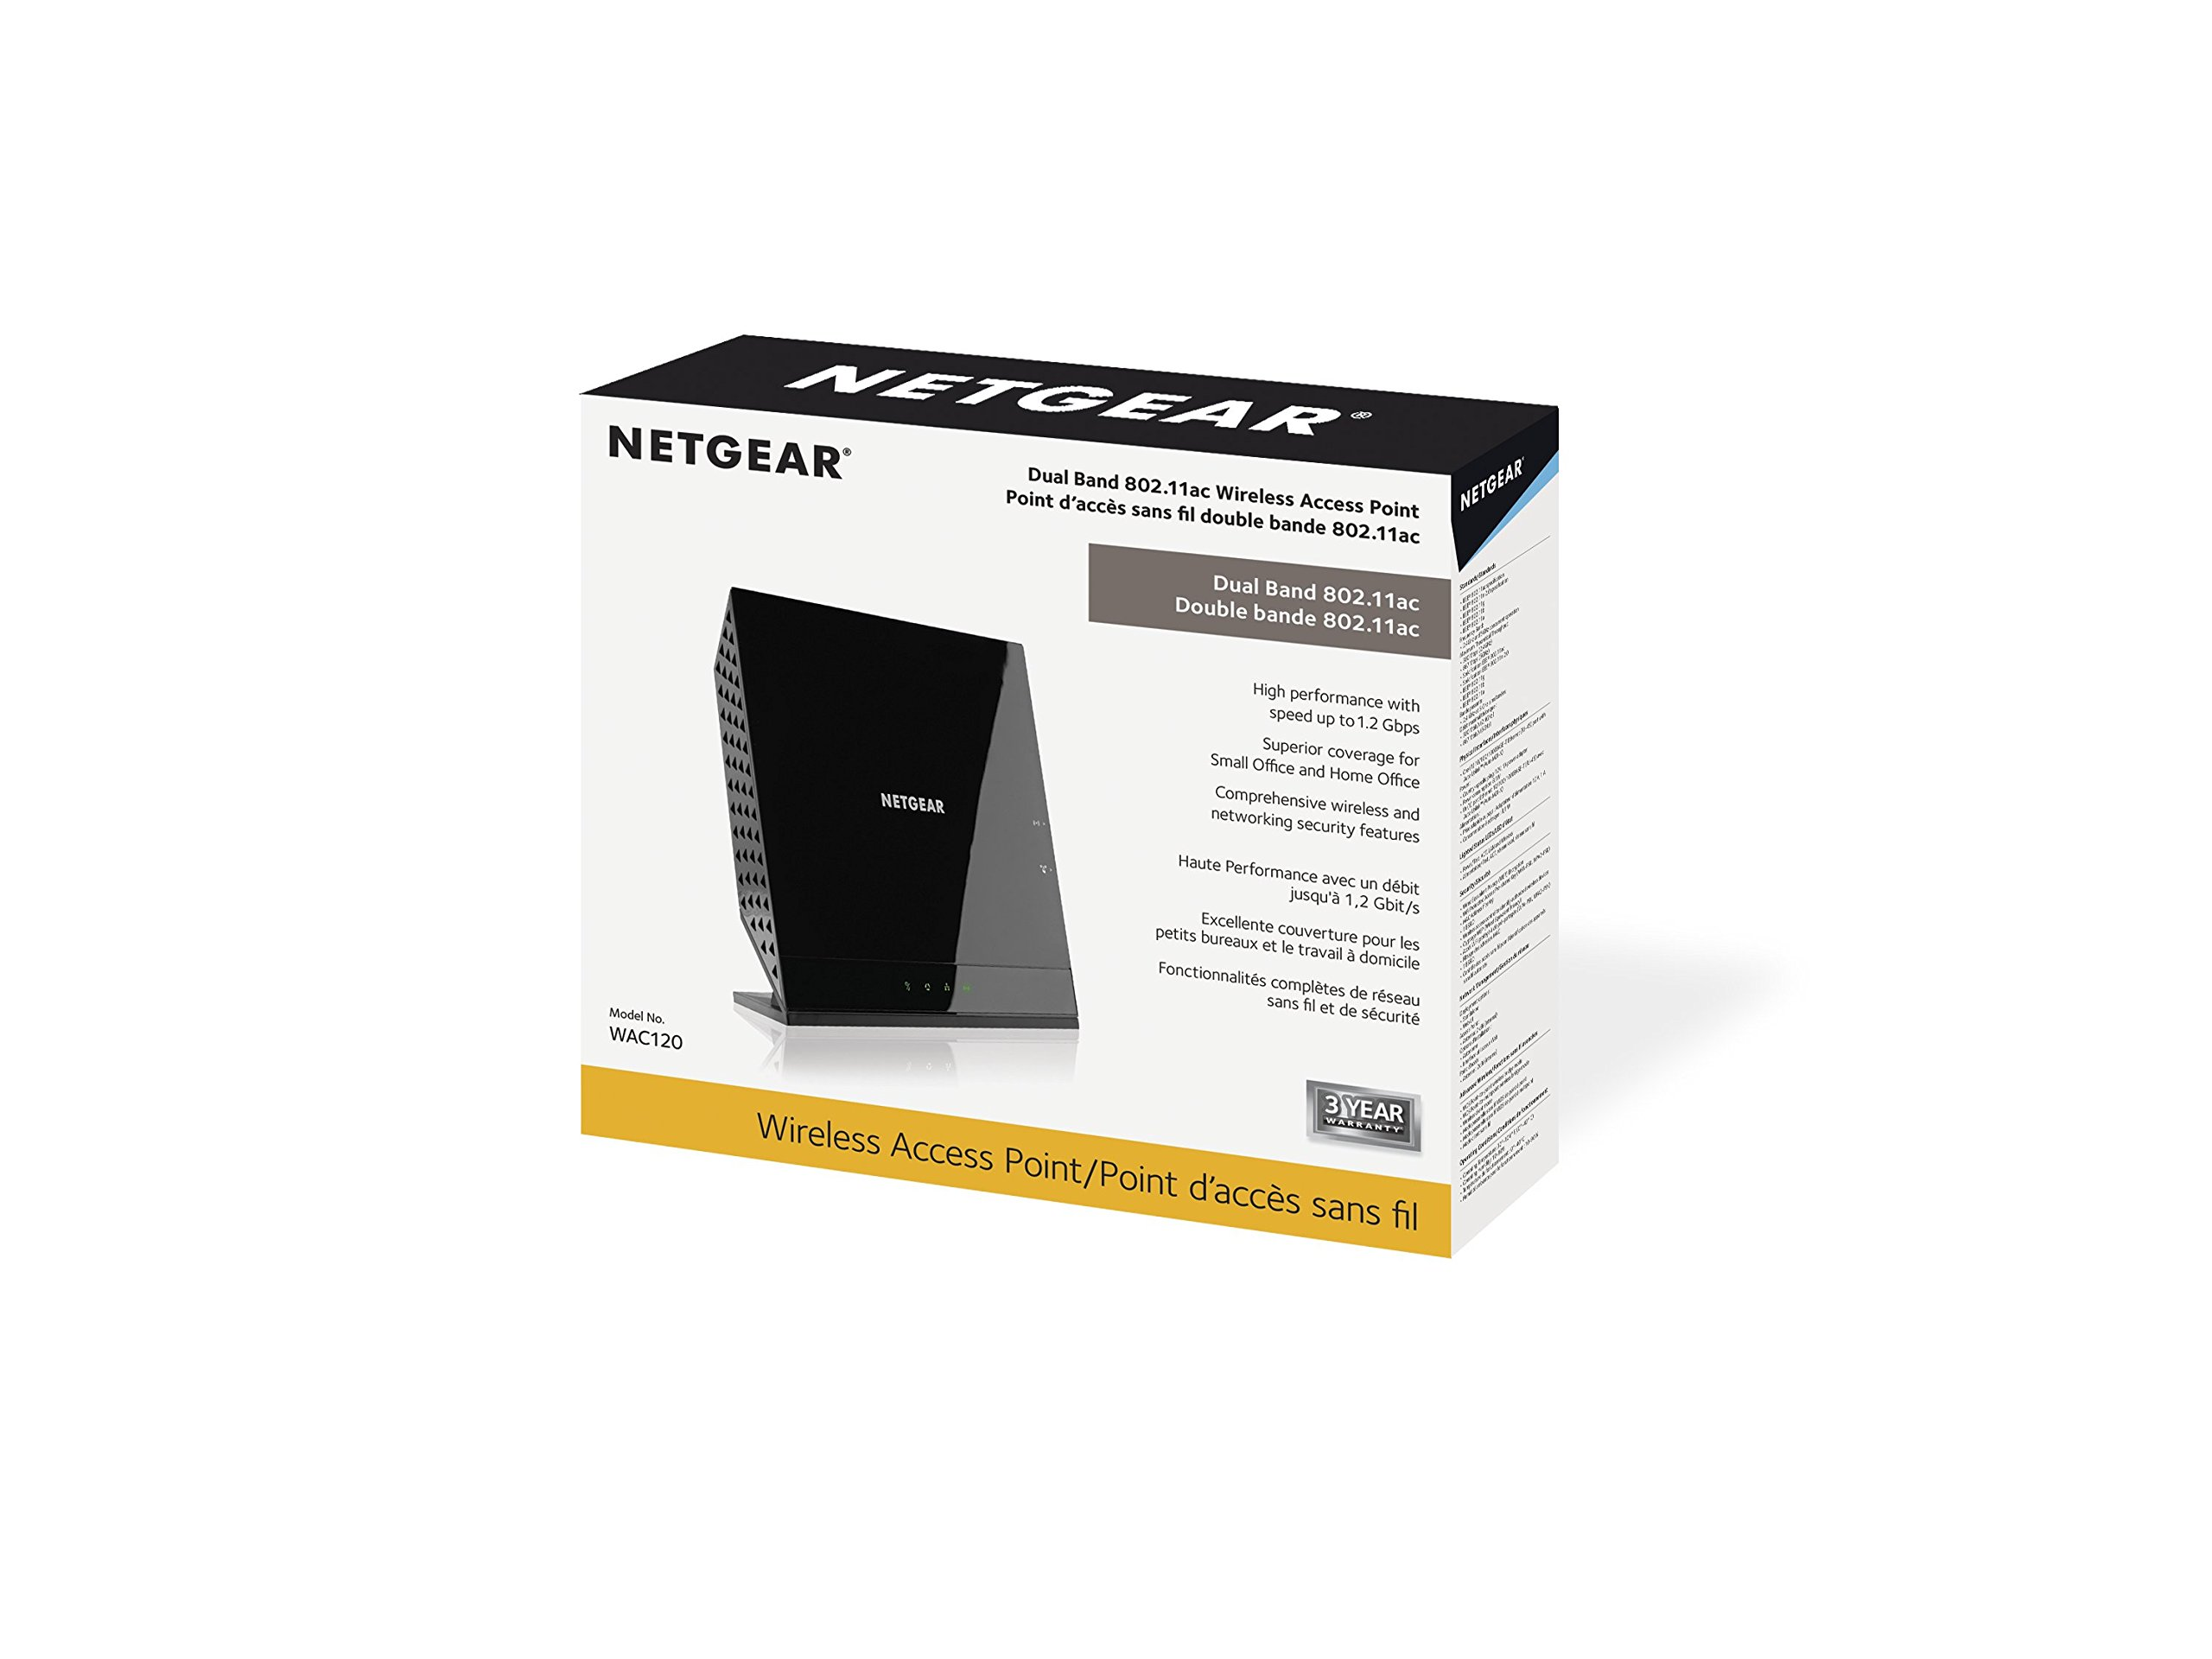 NETGEAR Dual Band 802.11ac Wireless Access Point (WAC120-100NAS)